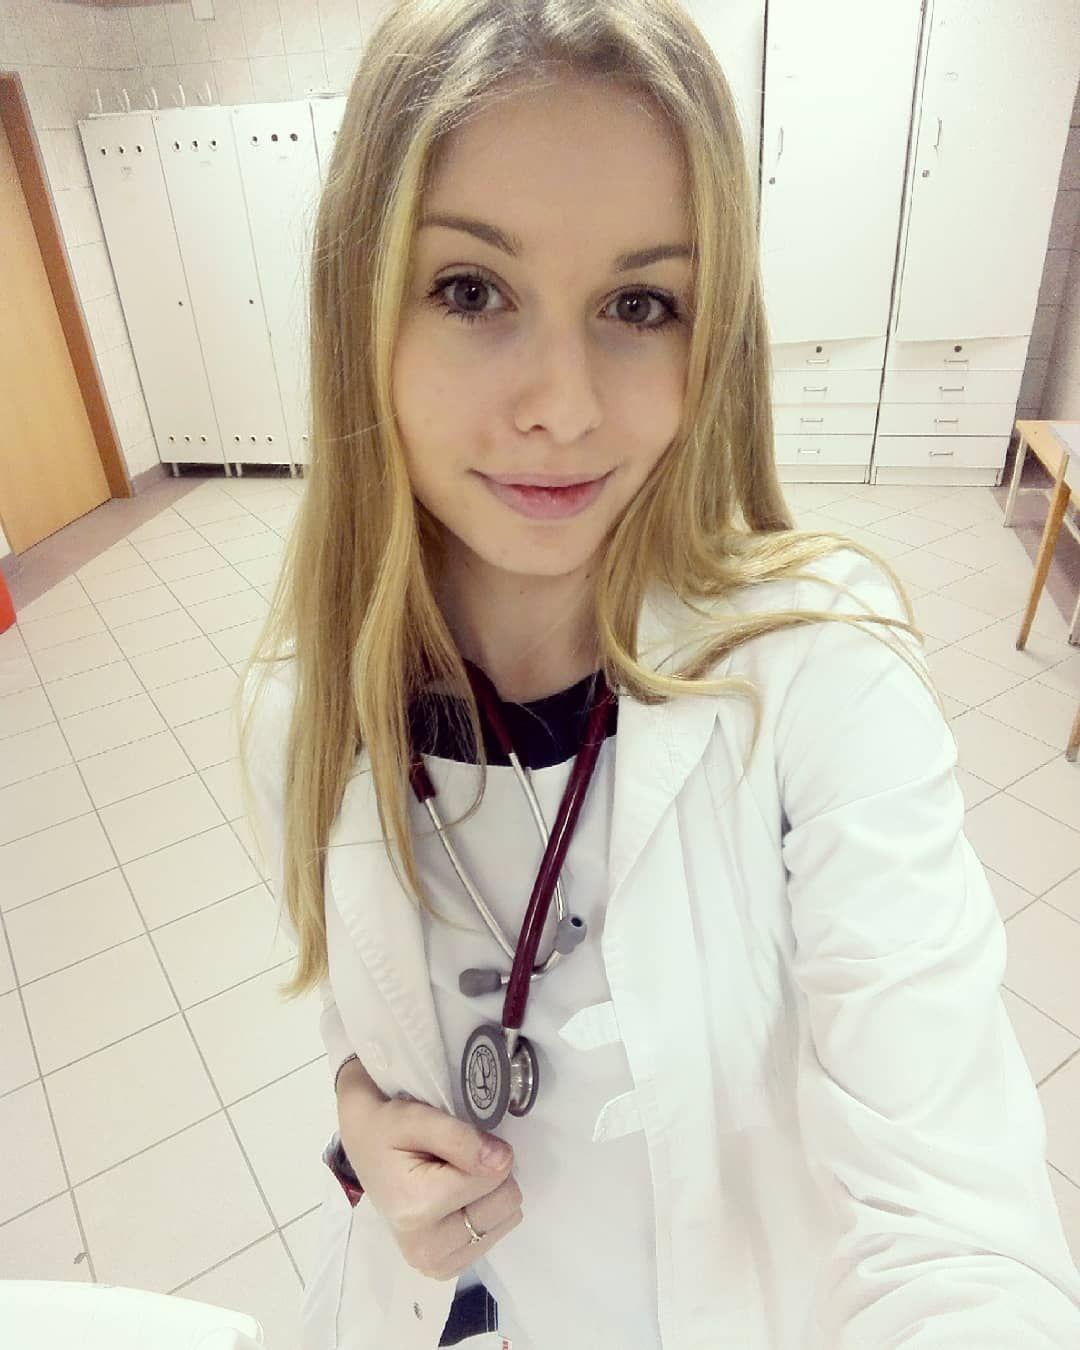 Pin on Hot & Sexy Nurse